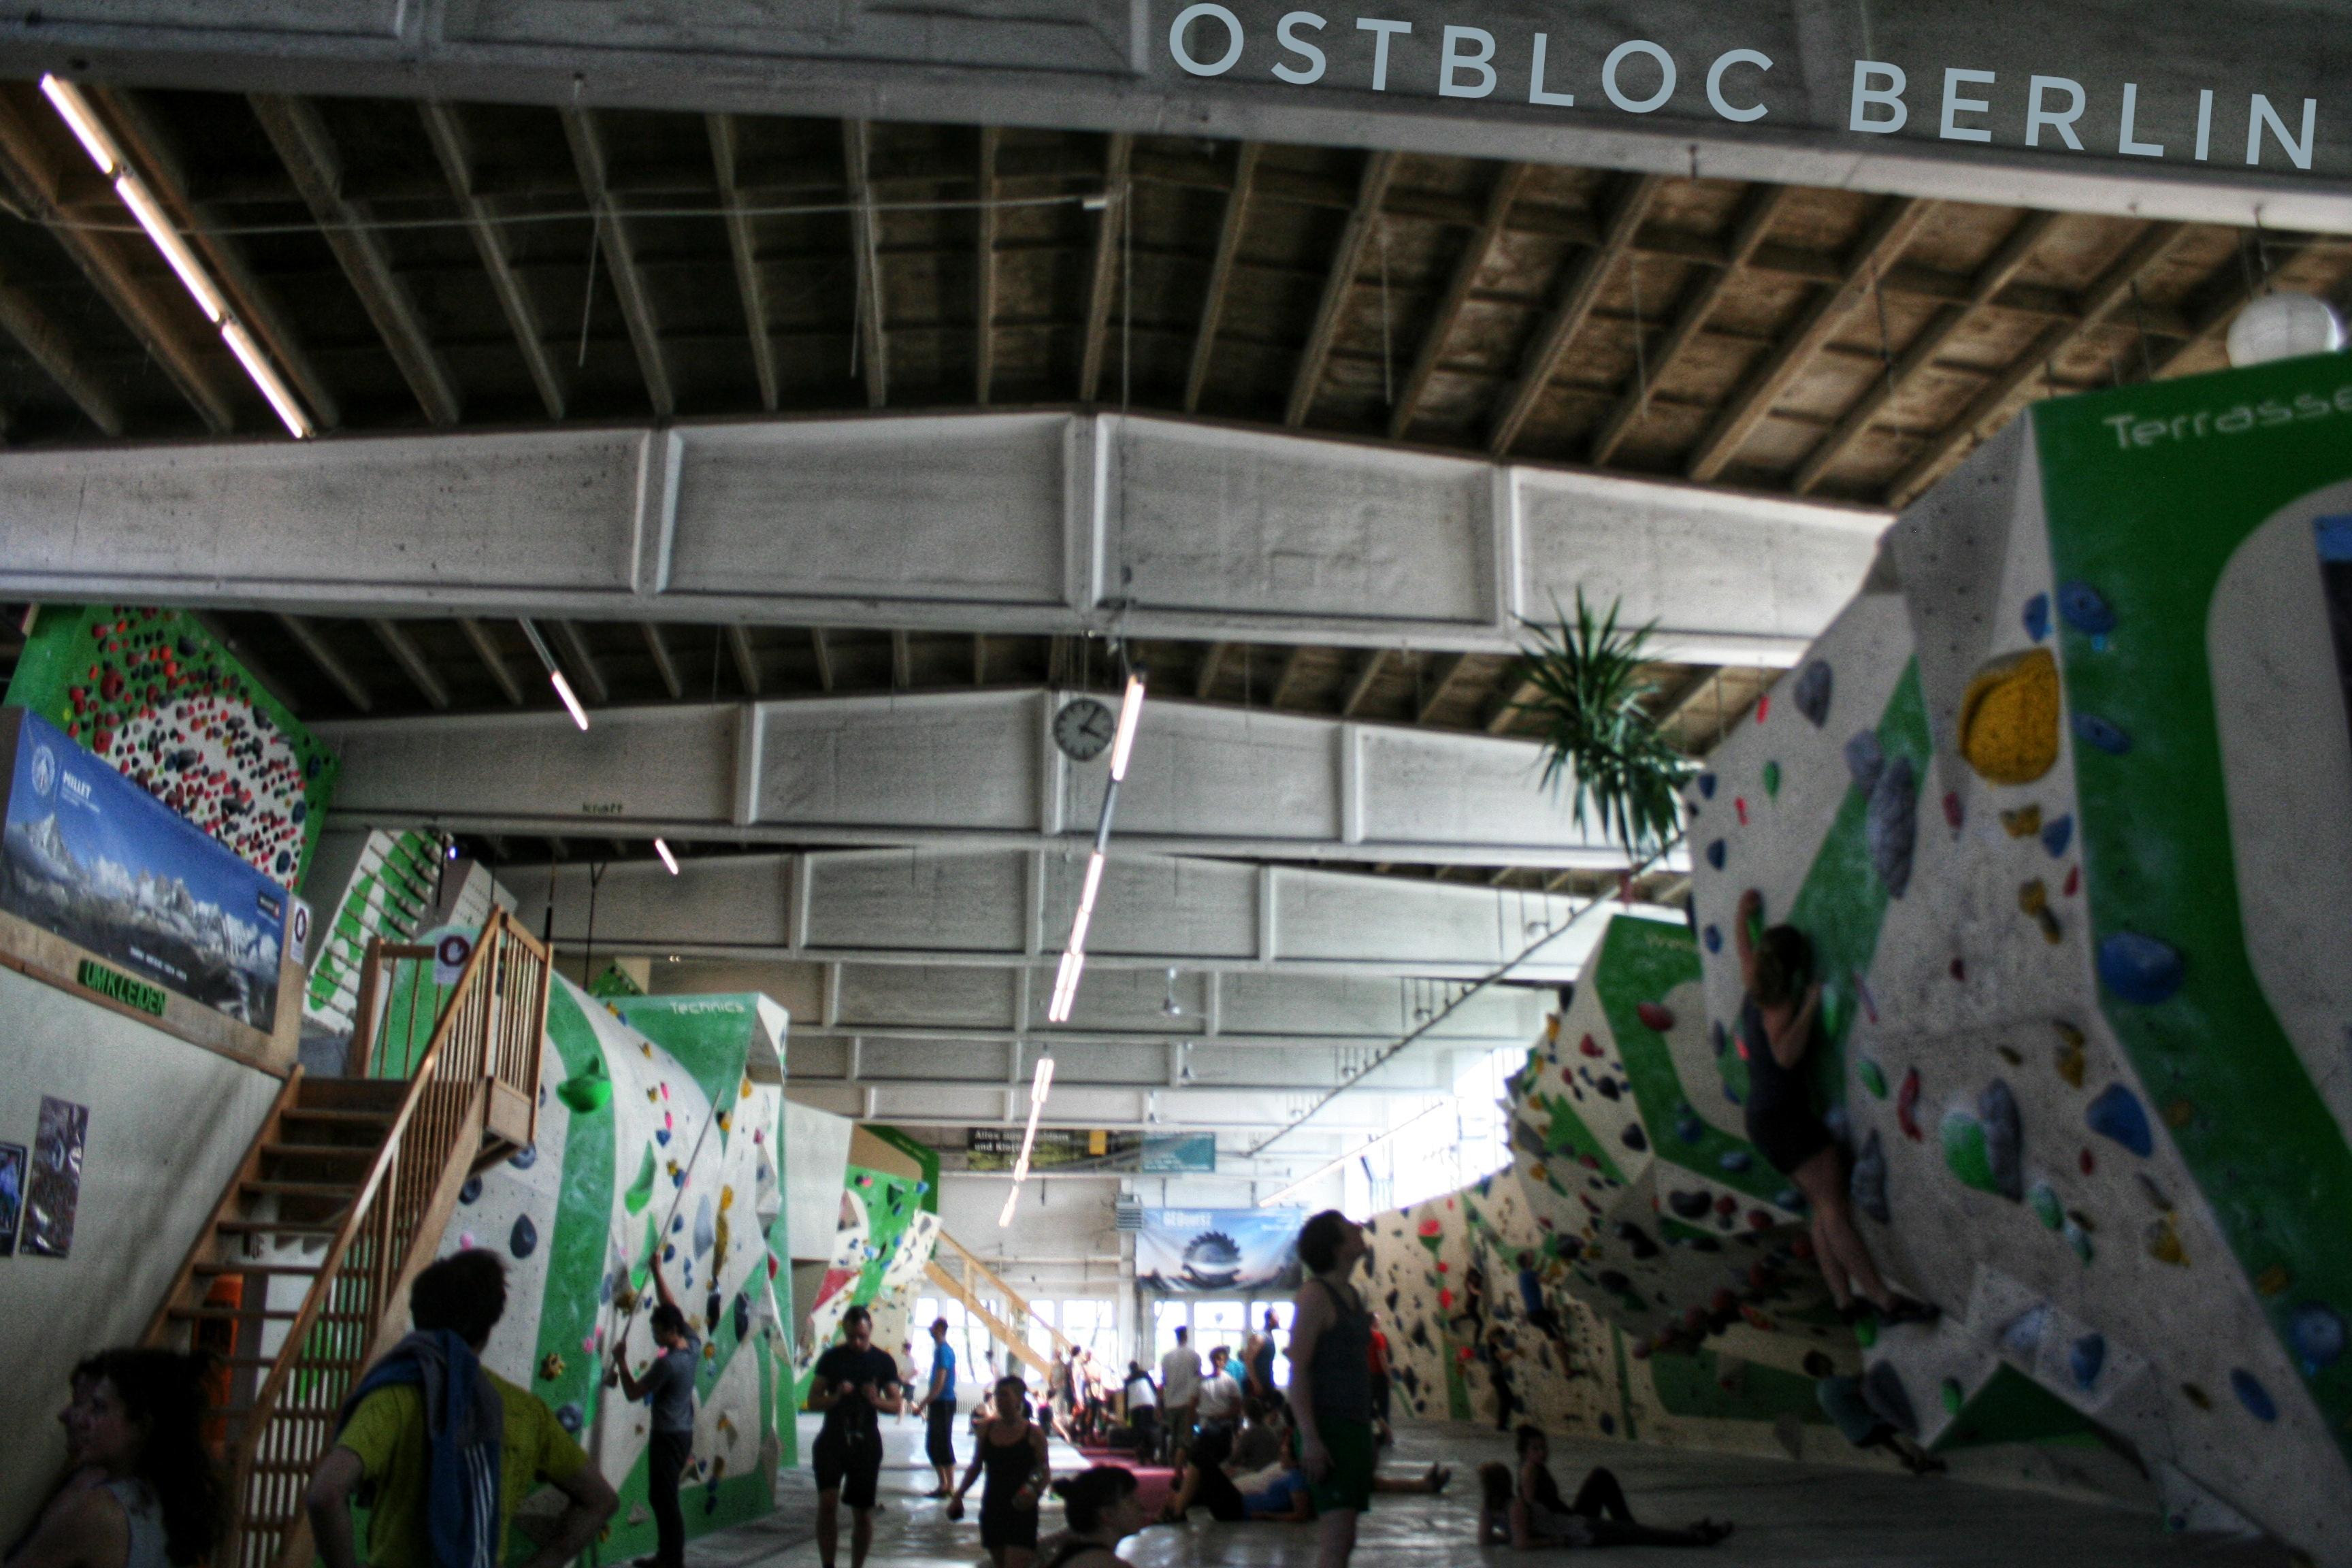 Ostbloc Berlin